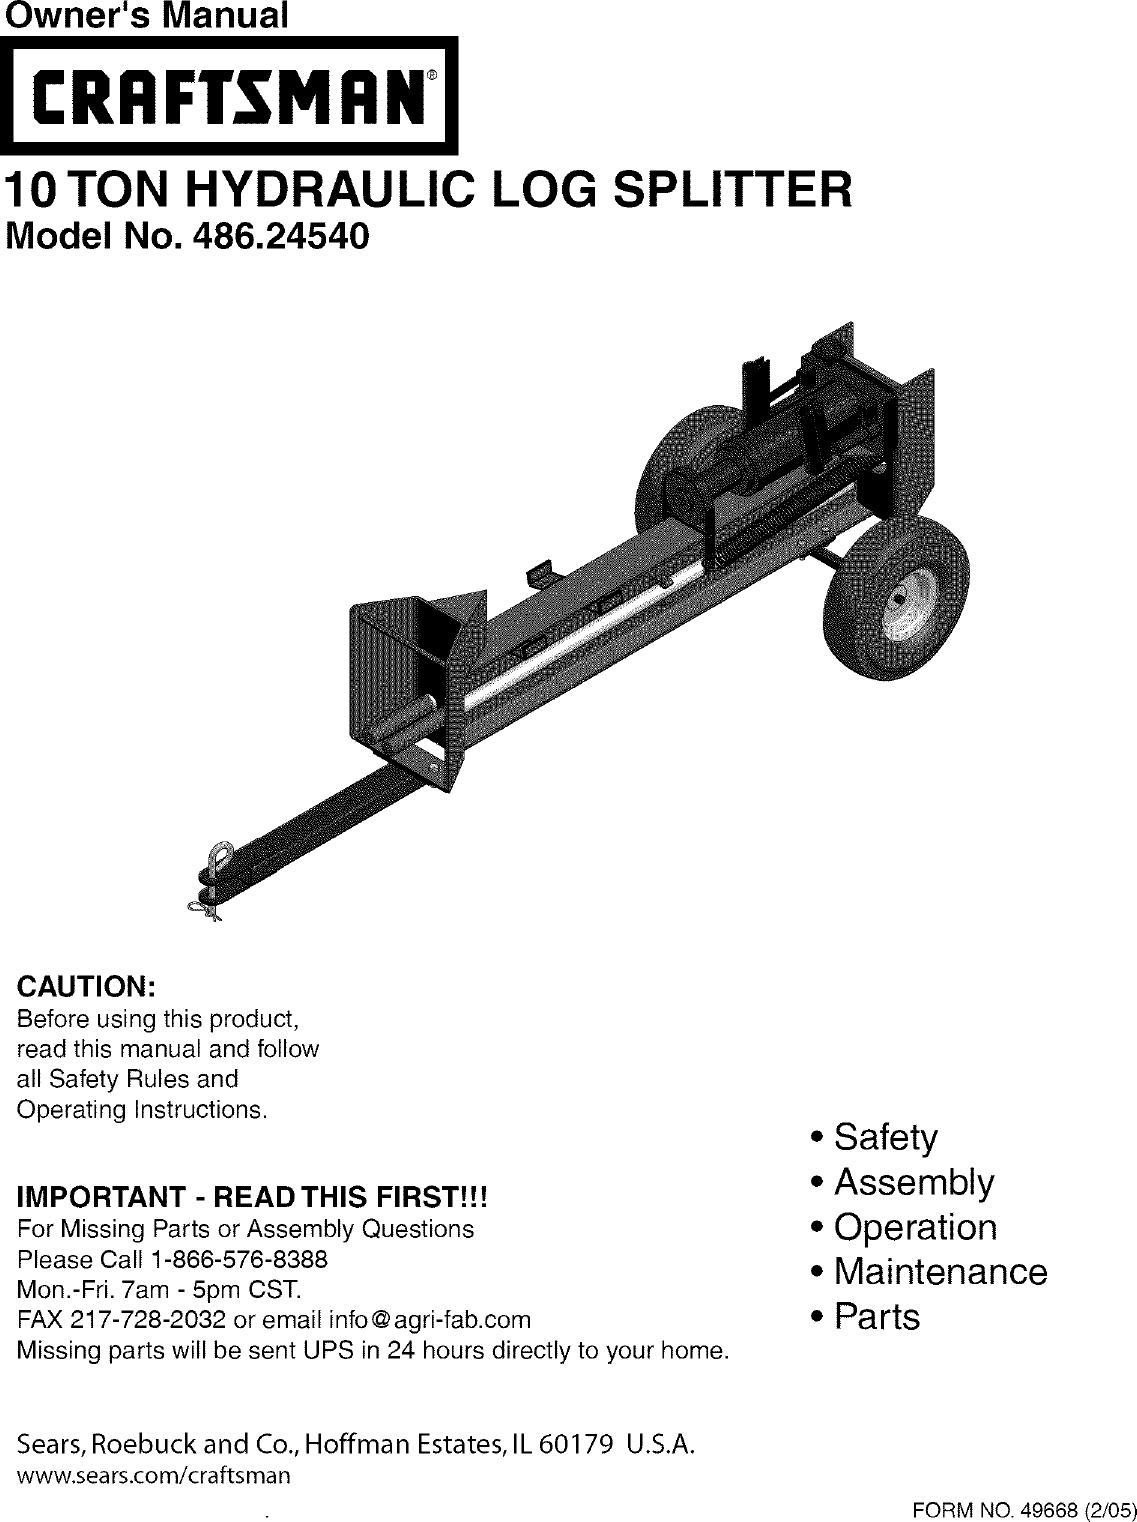 Craftsman 48624540 User Manual 10 TON HYDRAULIC LOG